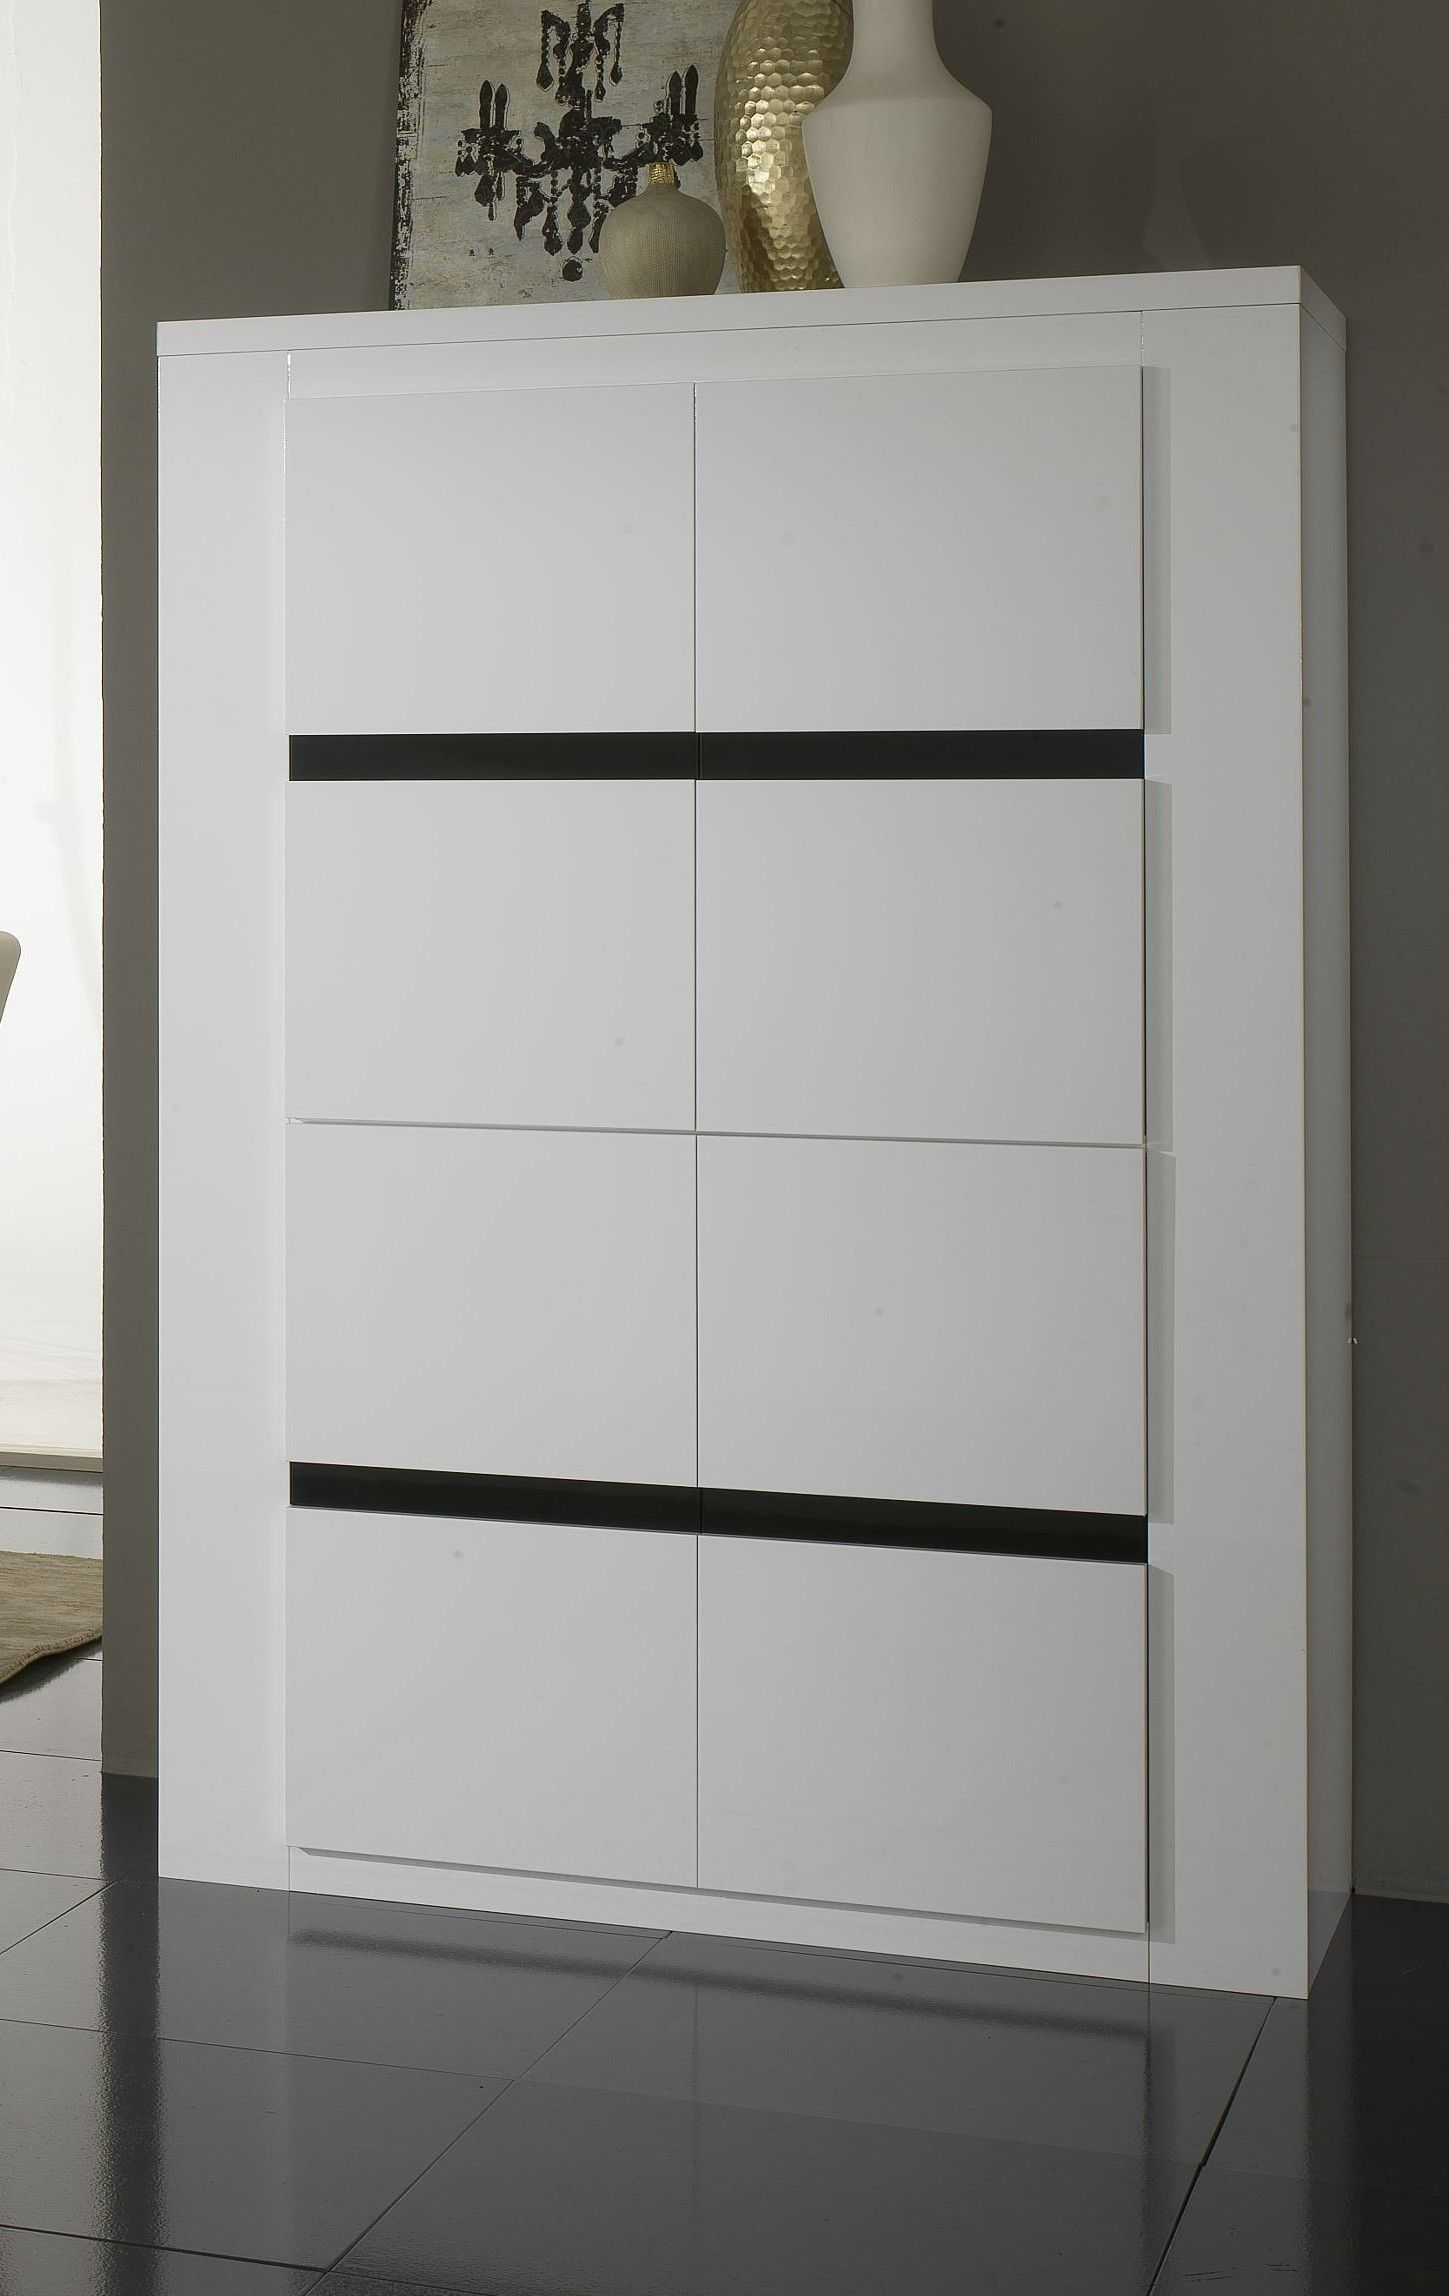 Buffet Haut Laqu Blanc Design Clara Buffet Haut Moderne Design  # Meuble Haut Pour Salon Blanc Laque